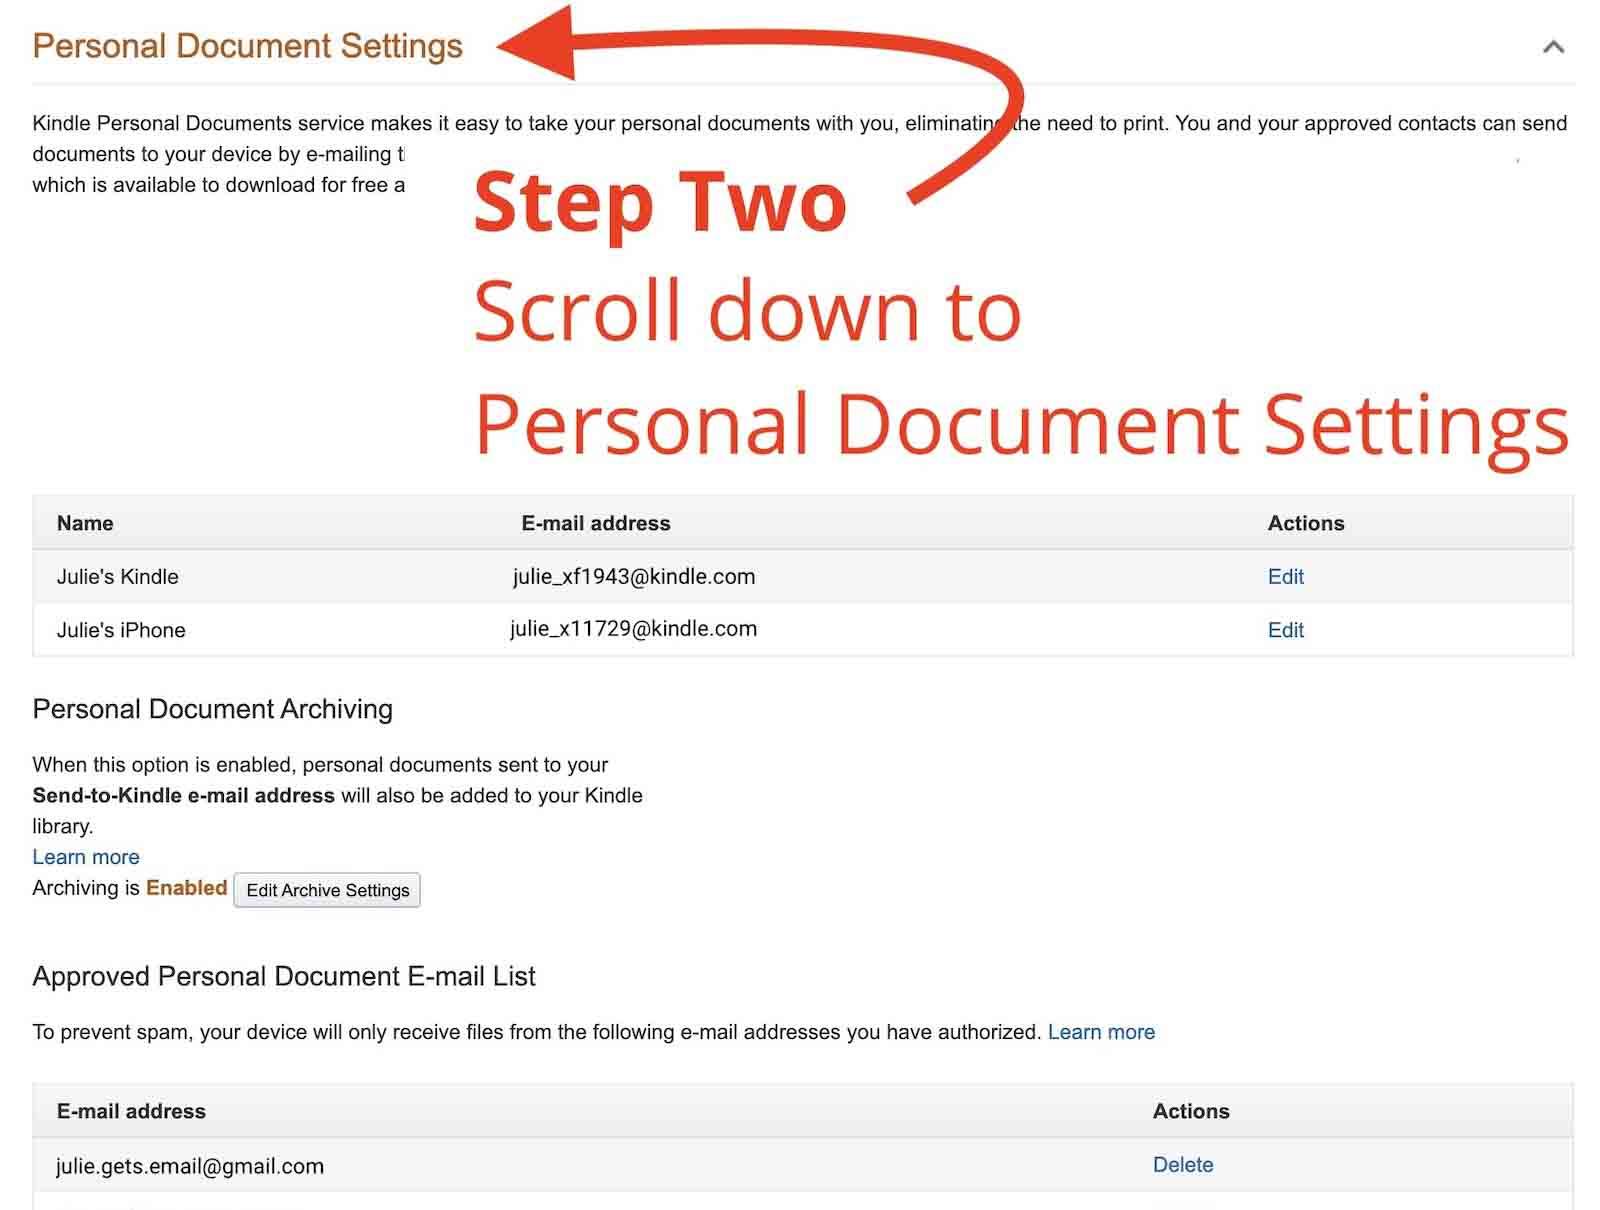 Screenshot Amazon Personal Document Settings